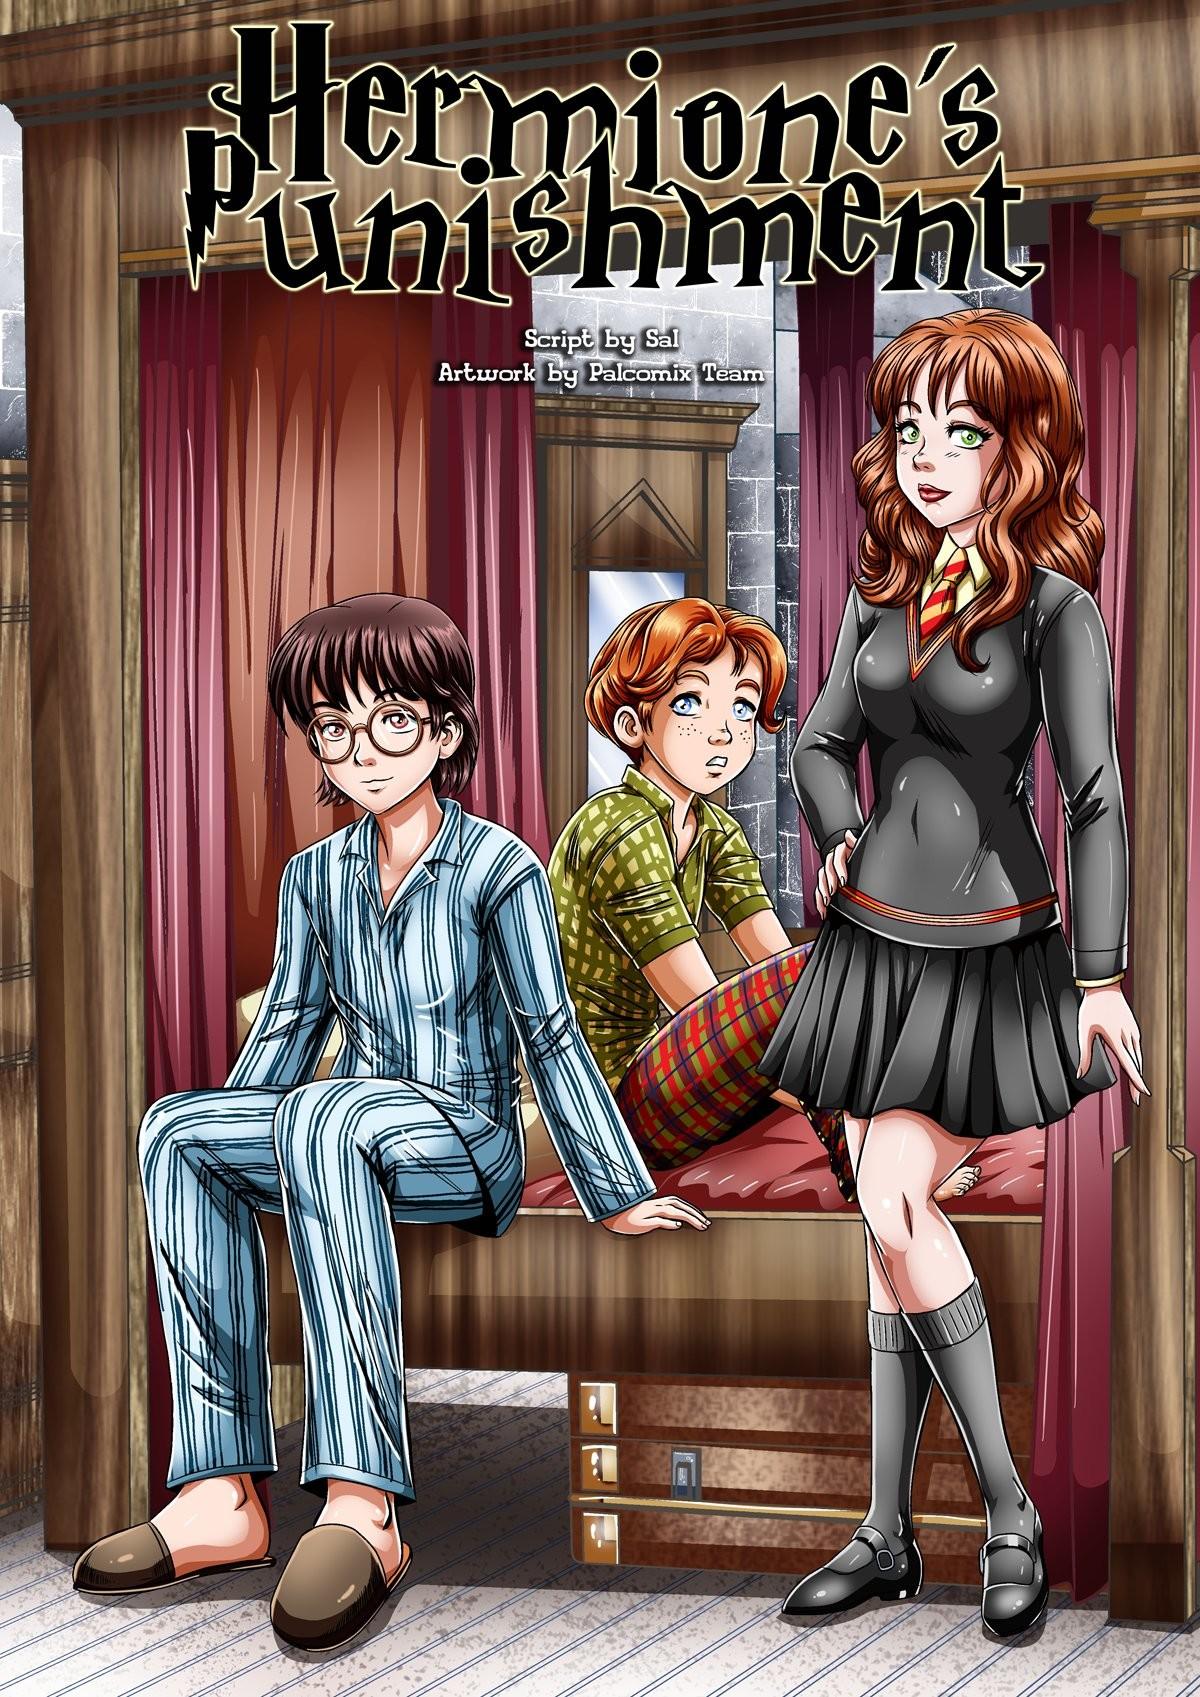 Goodcomix.tk E:Harry Potter - [Palcomix][VIP] - Hermione's Punishment